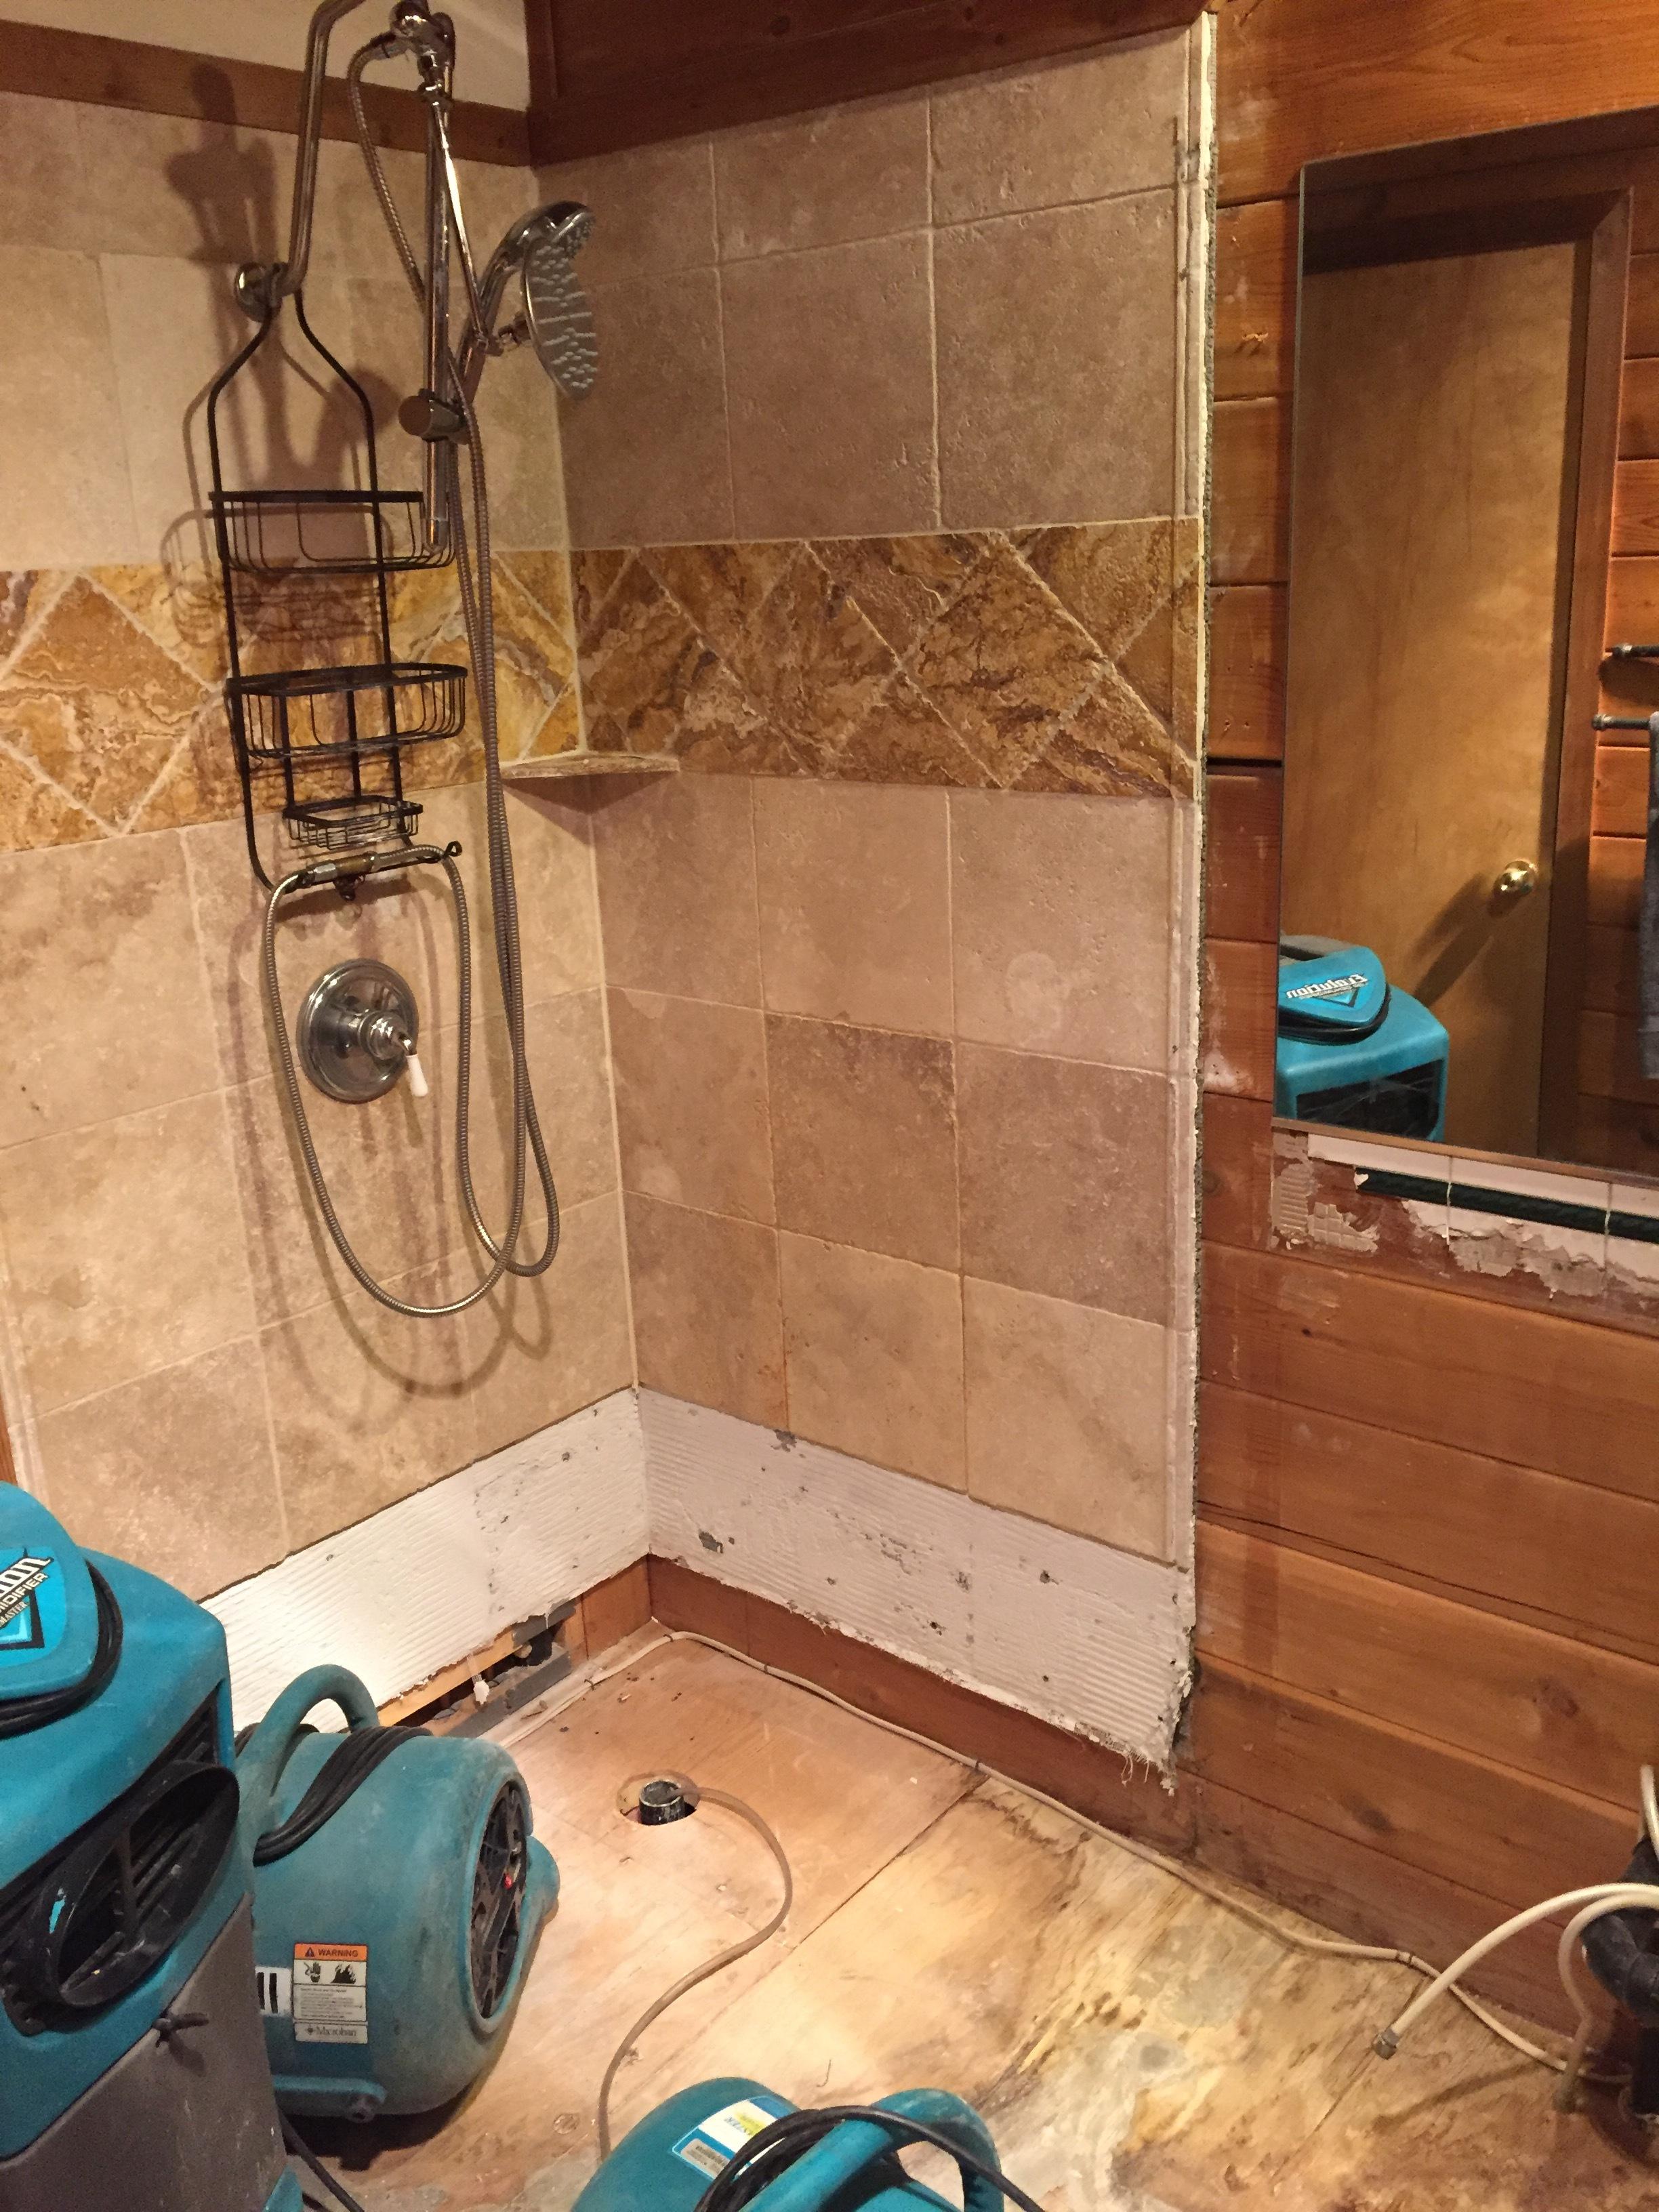 Bathroom torn apart